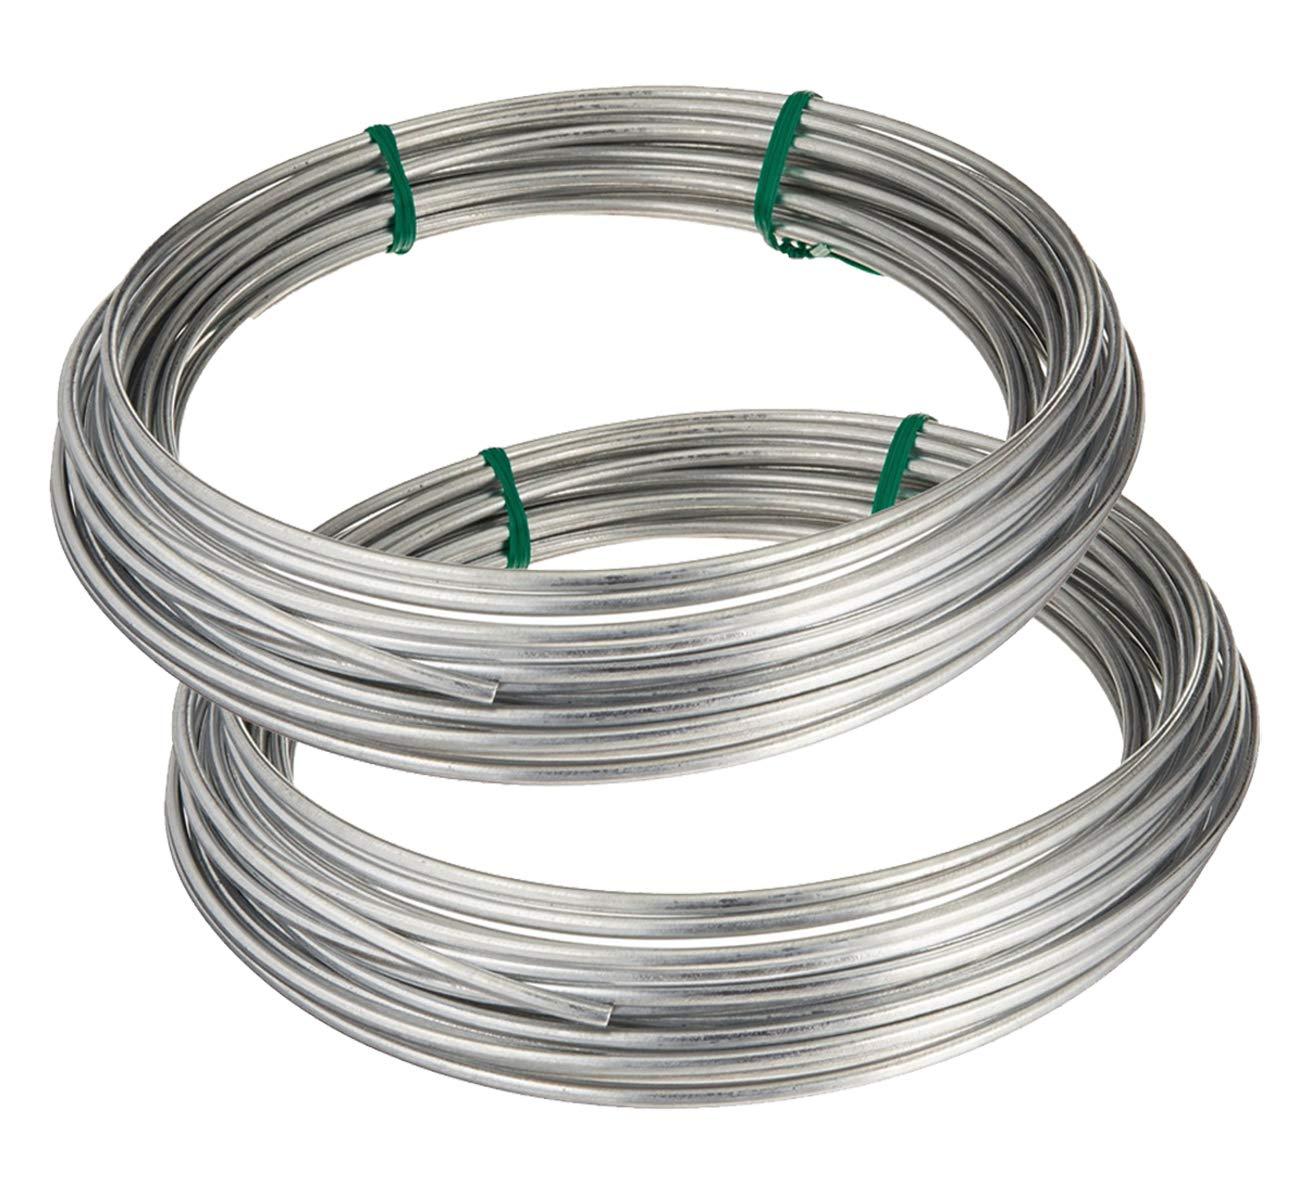 Amazon.com: Hillman 122062 Galvanized Solid Wire 9 Gauge, 50 foot ...